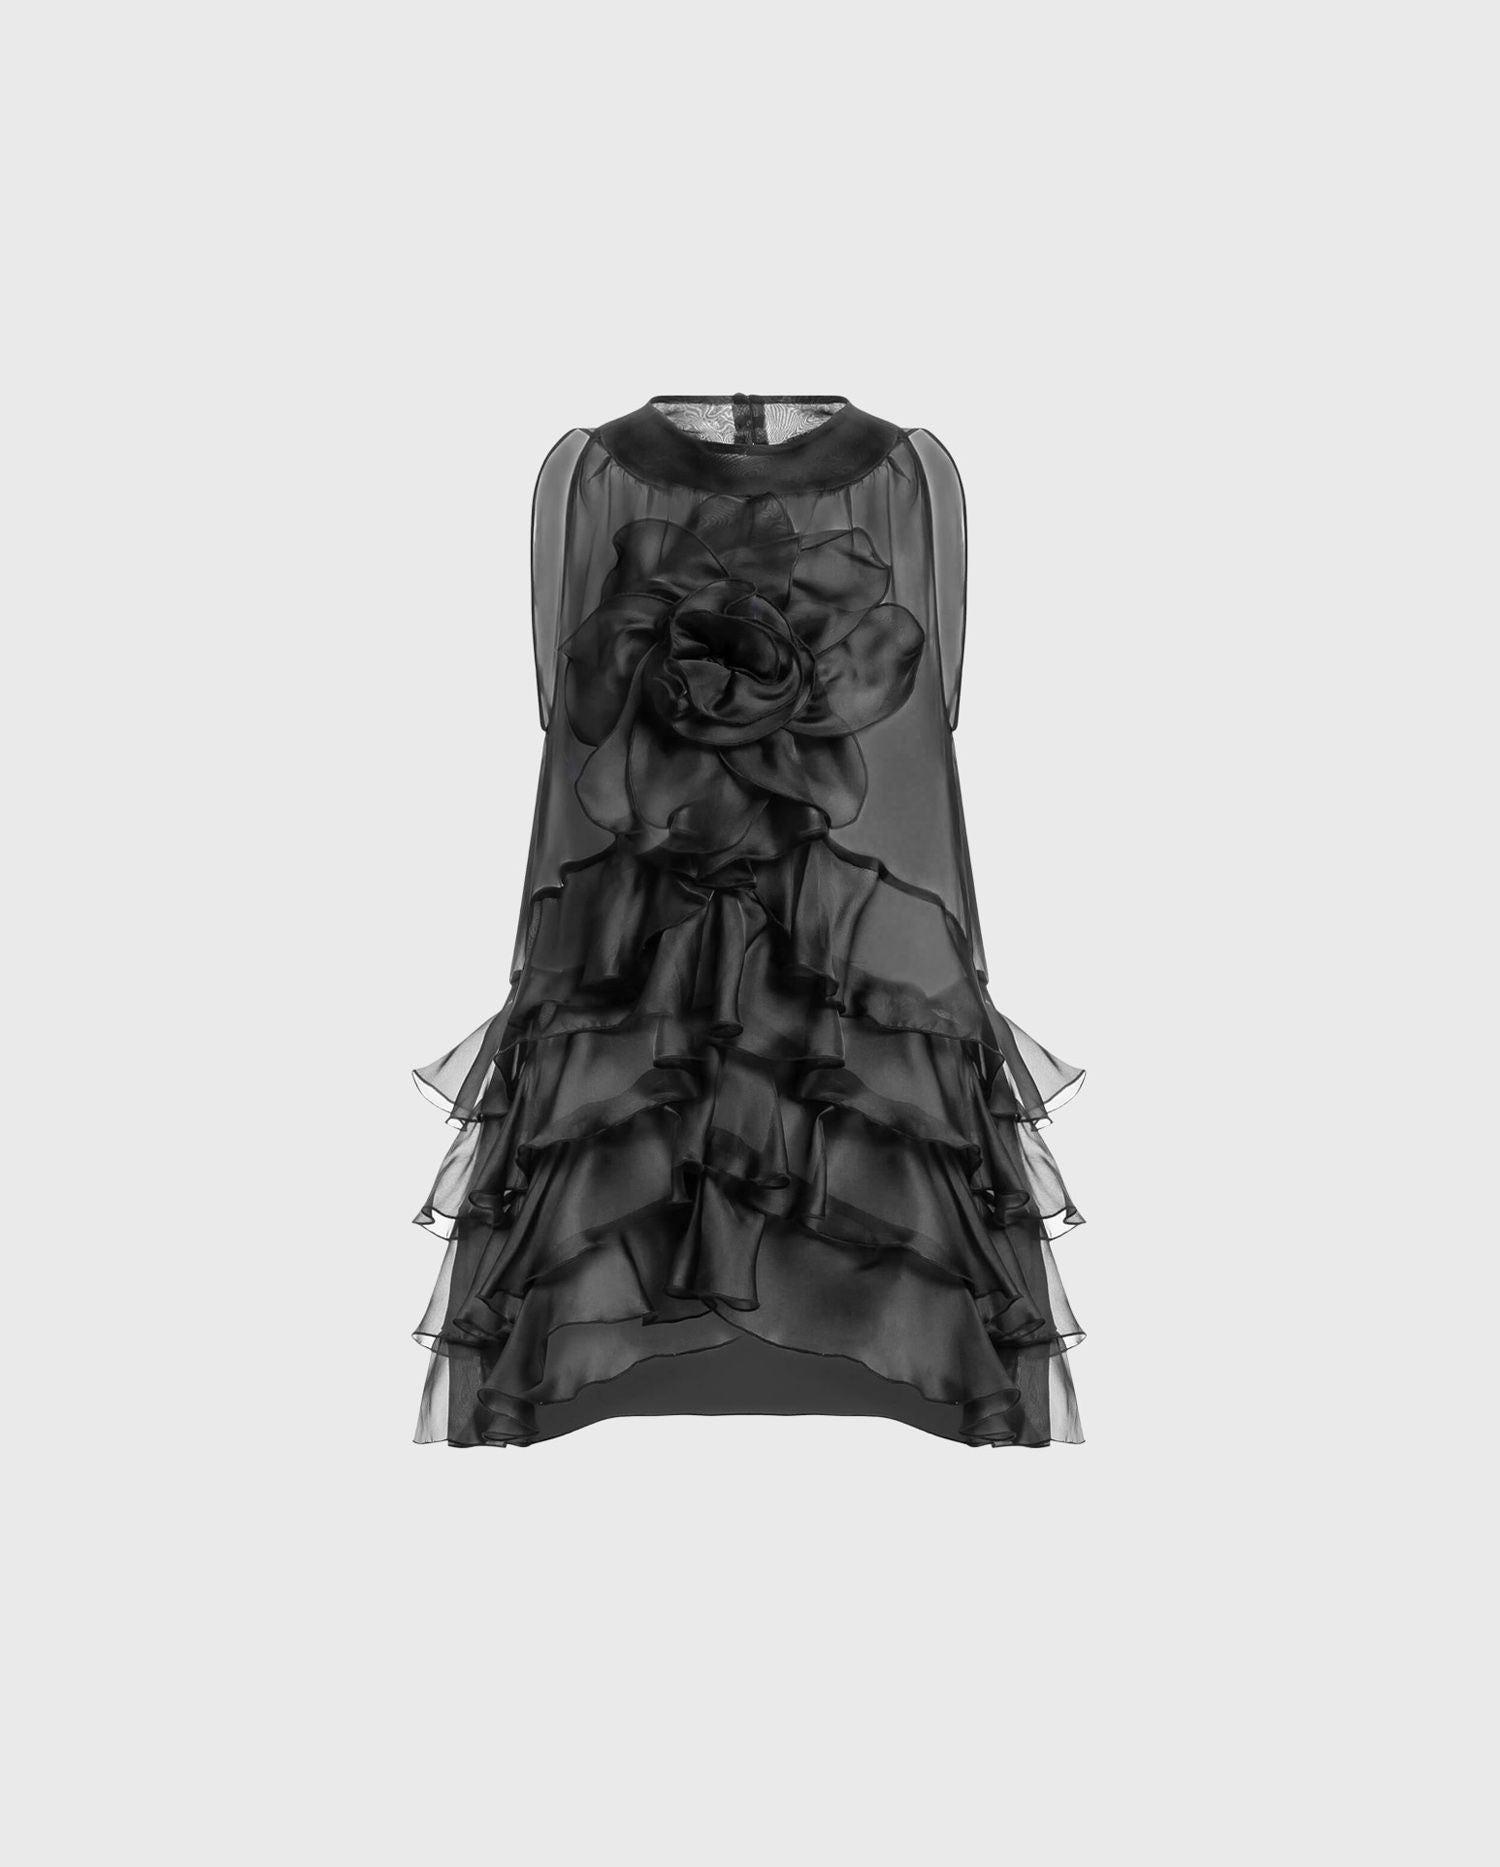 ANNE FONTAINE AUBREY Blouse: Black sleeveless blouse in layered silk organza